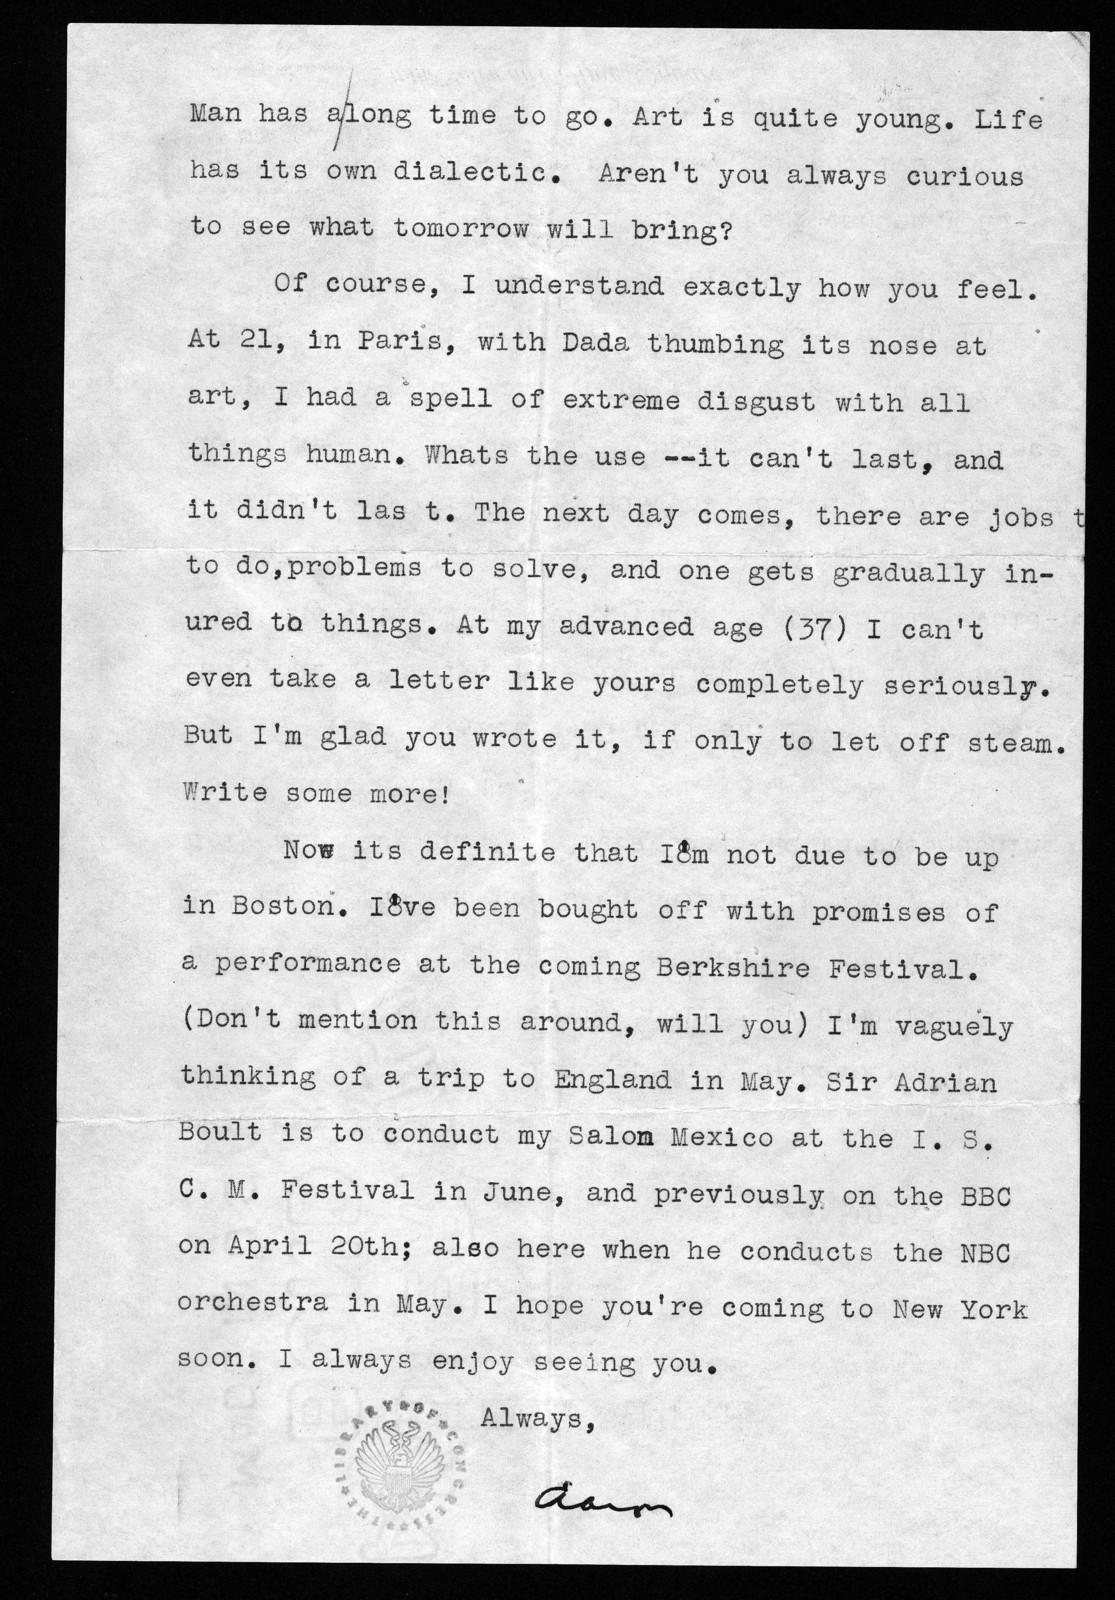 Letter from Aaron Copland to Leonard Bernstein, March 23, 1938